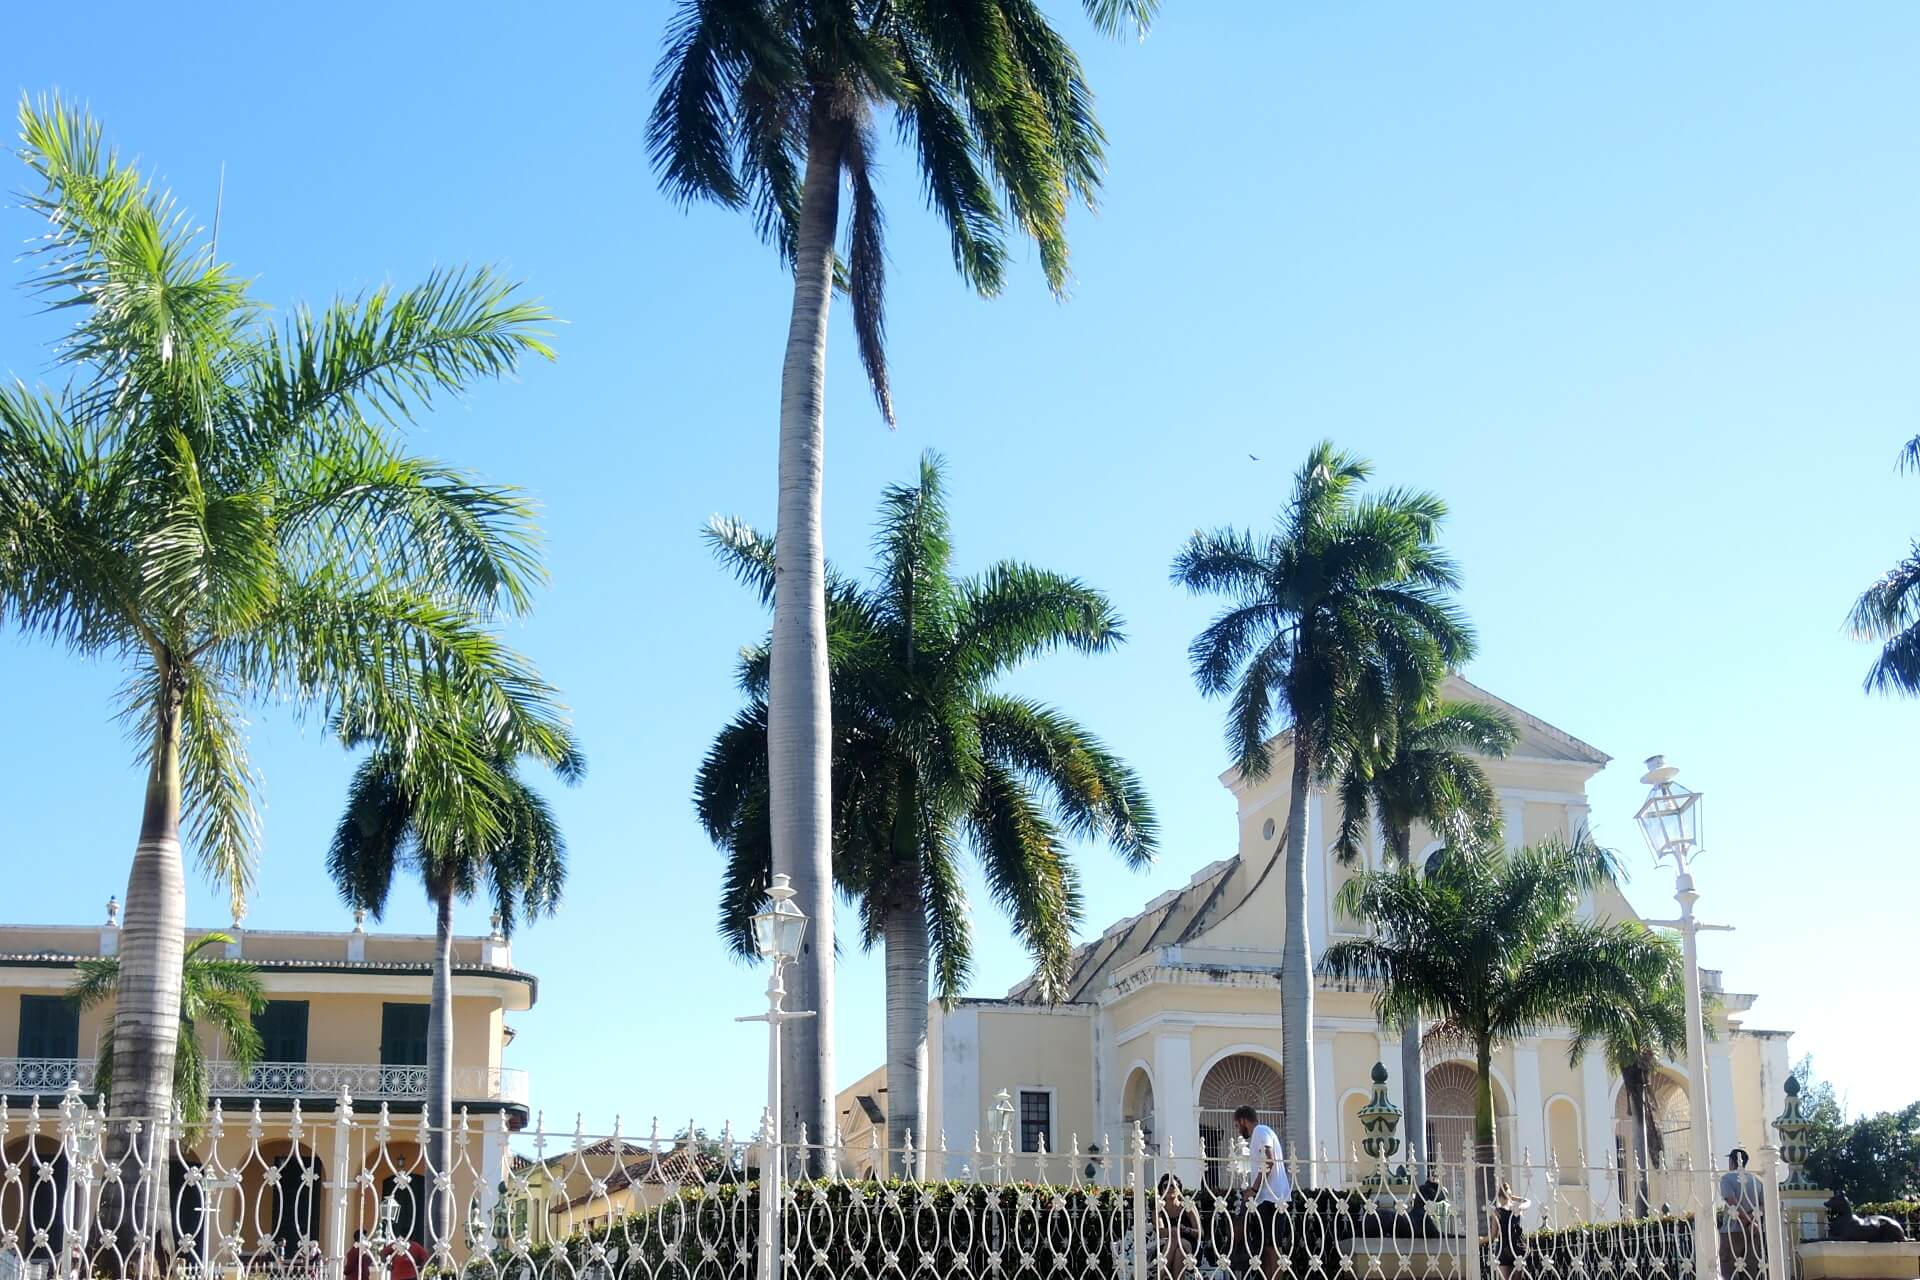 Kuba Sehenswürdigkeiten - Plaza Mayor Trinidad